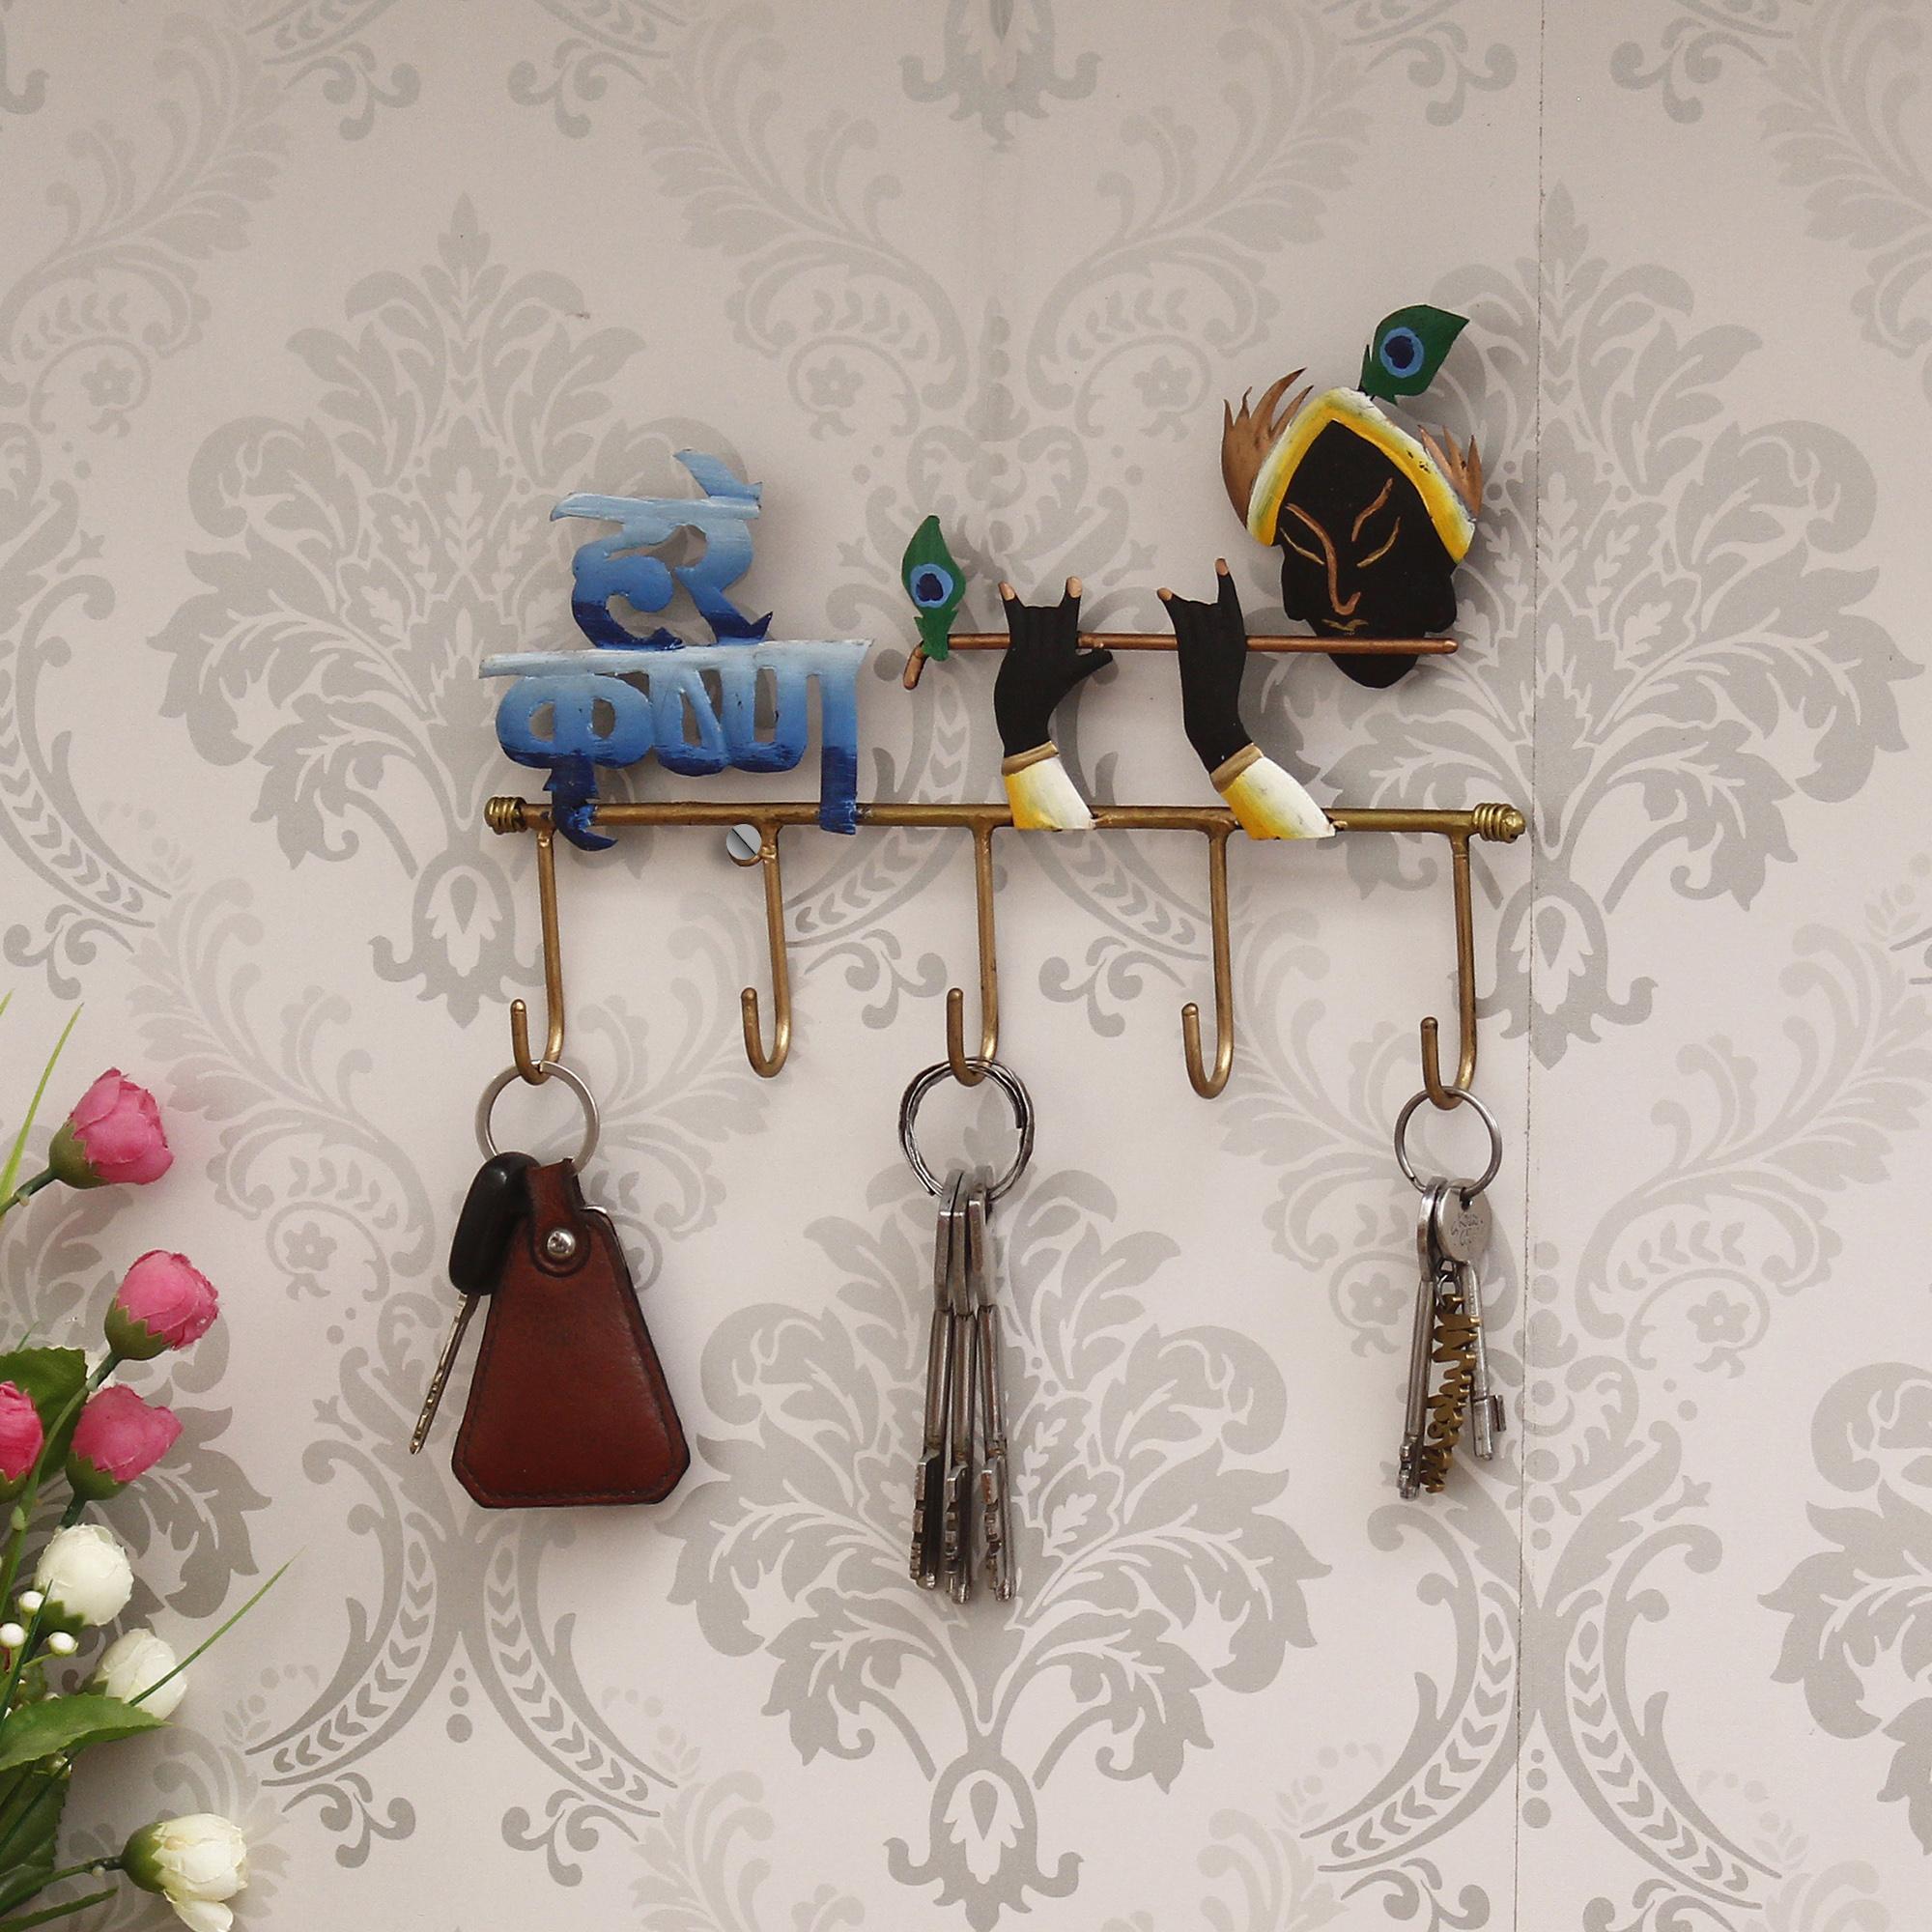 Hare Krishna Colorful Tribal Art 5 Hooks Iron Key Holder Indian Home Decor